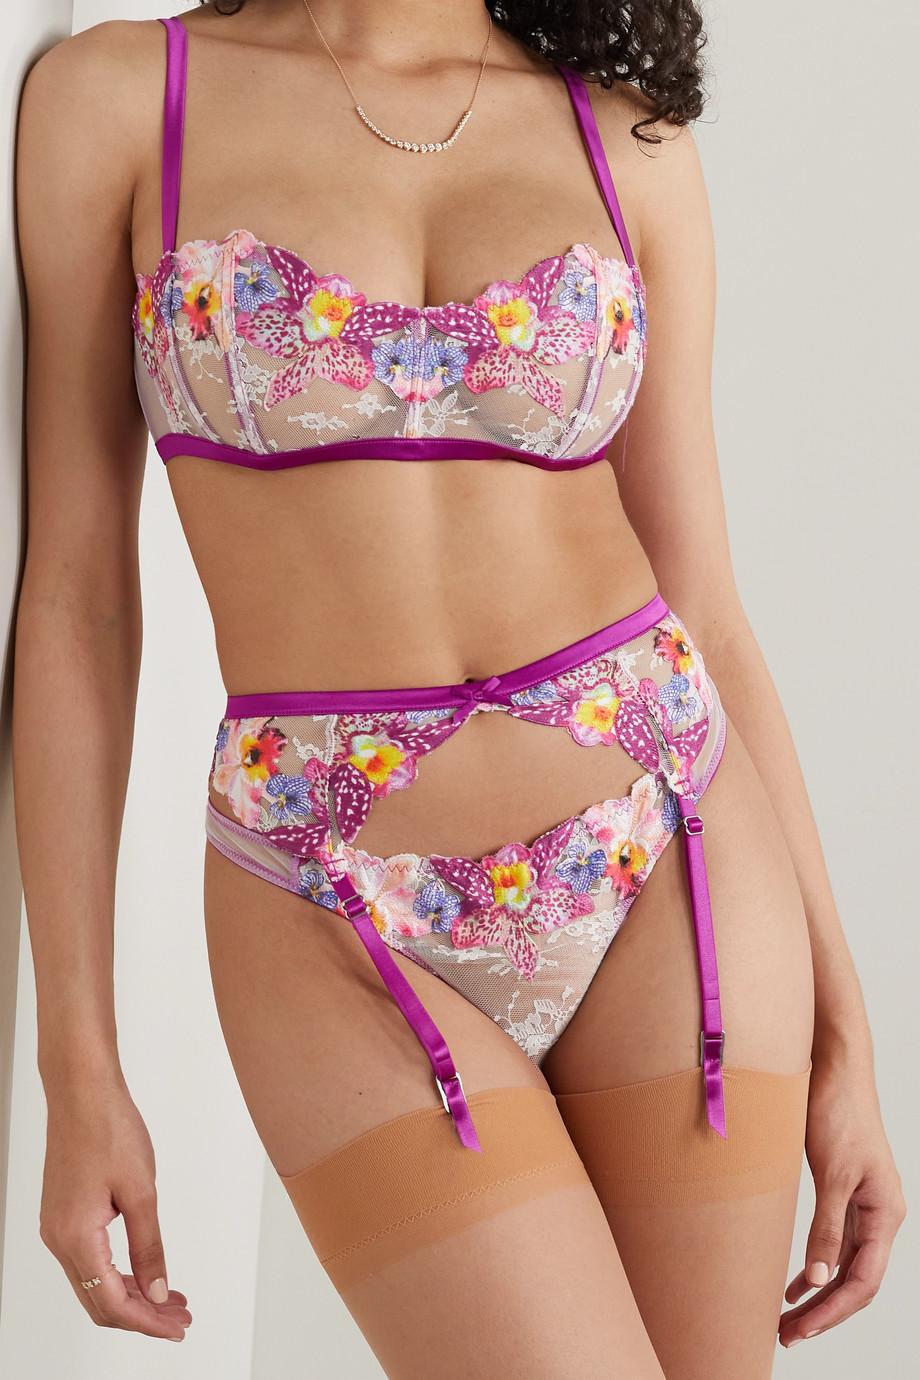 Fleur du Mal Orchid satin-trimmed appliquéd lace suspender belt